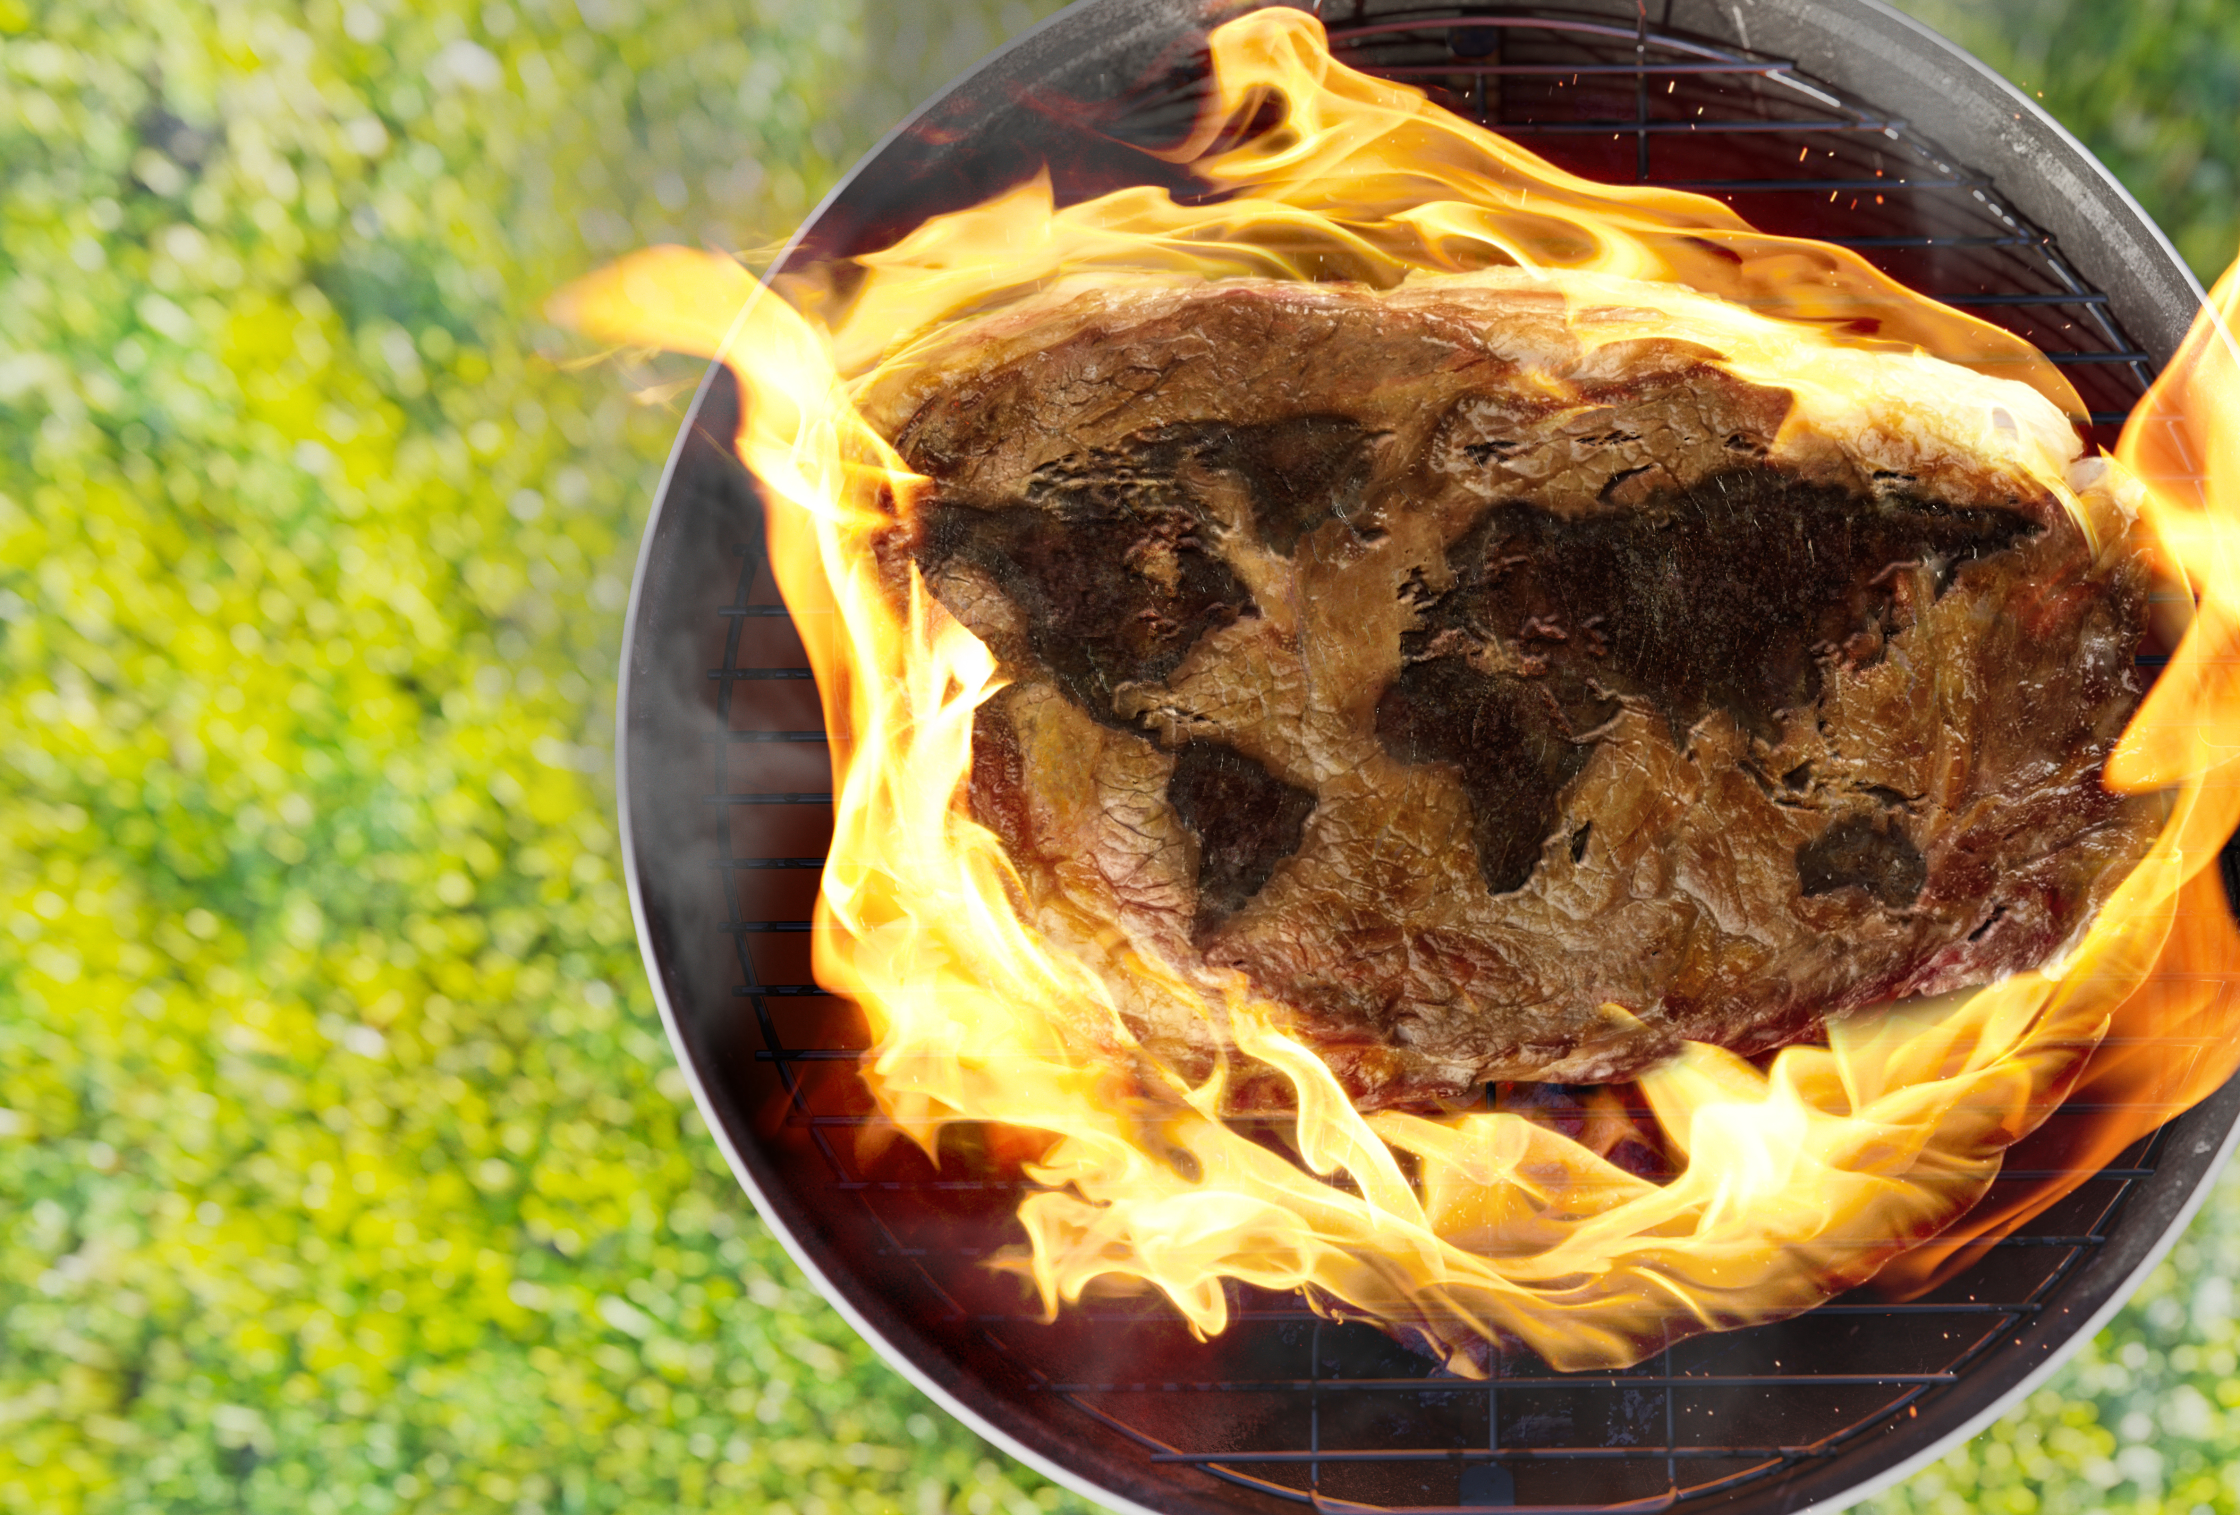 bbq steak v3 higresRGB.jpg